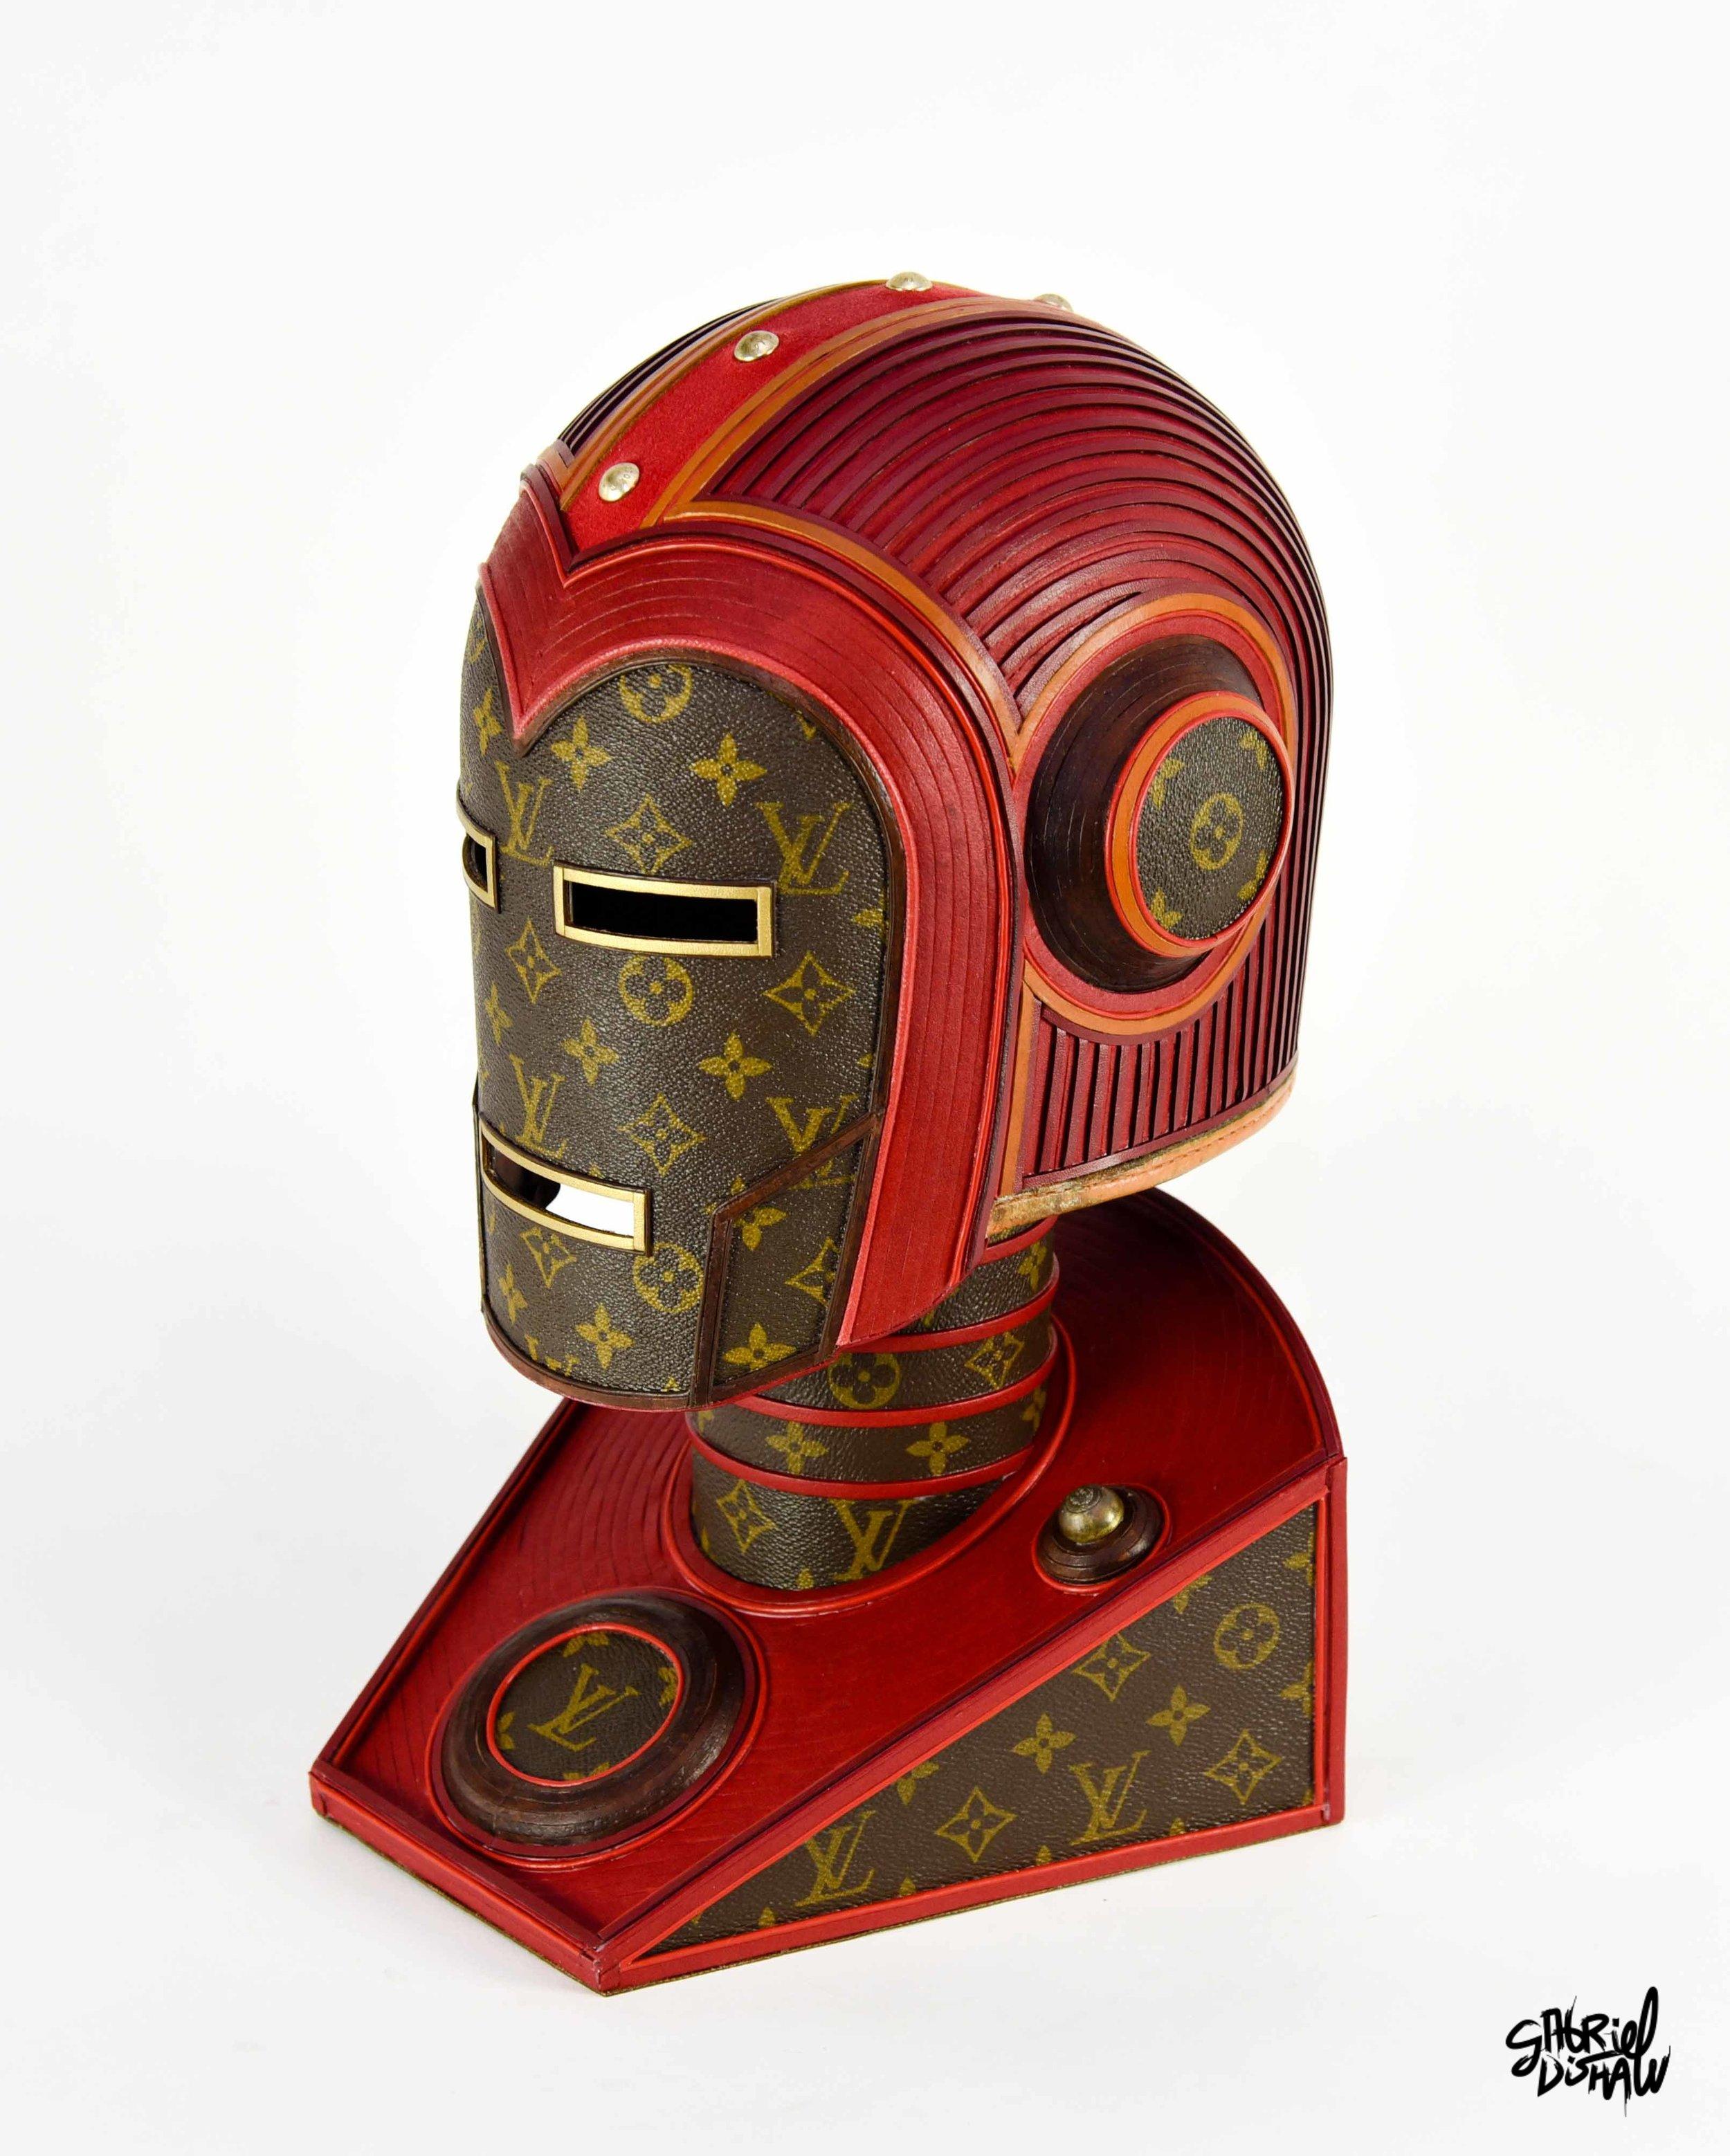 Gabriel Dishaw Vintage Iron Man LV-0168.jpg